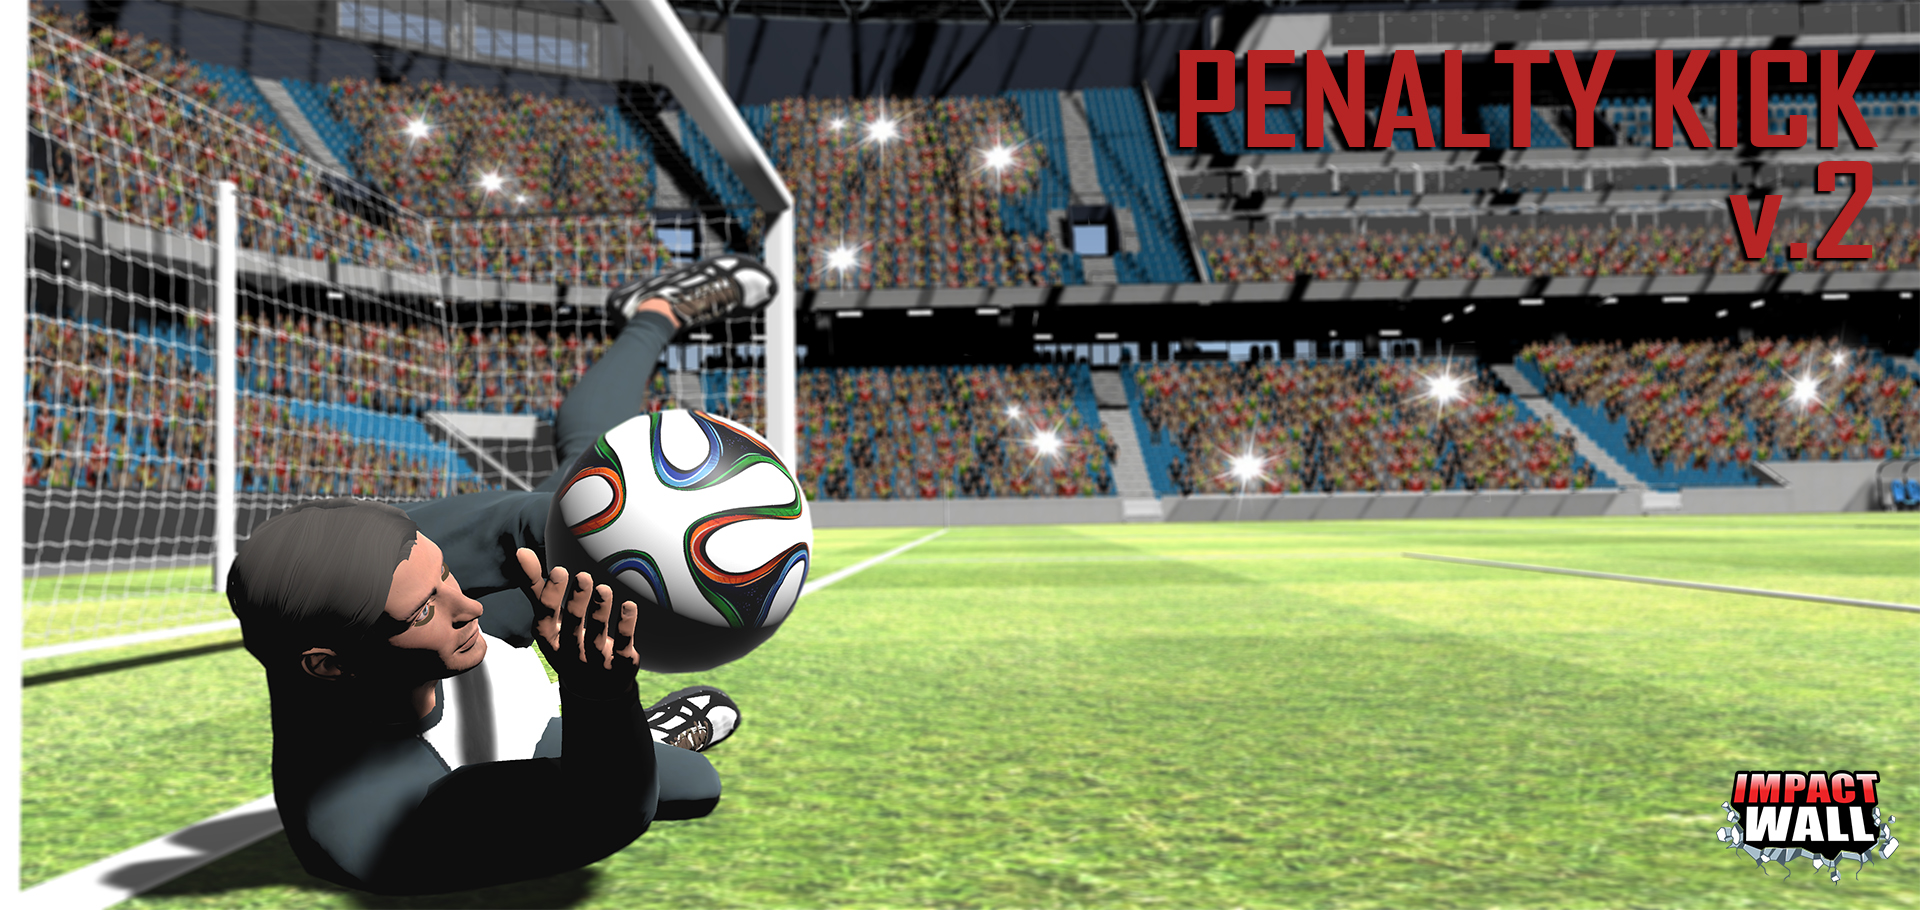 PenaltyKick_JPEG.jpg